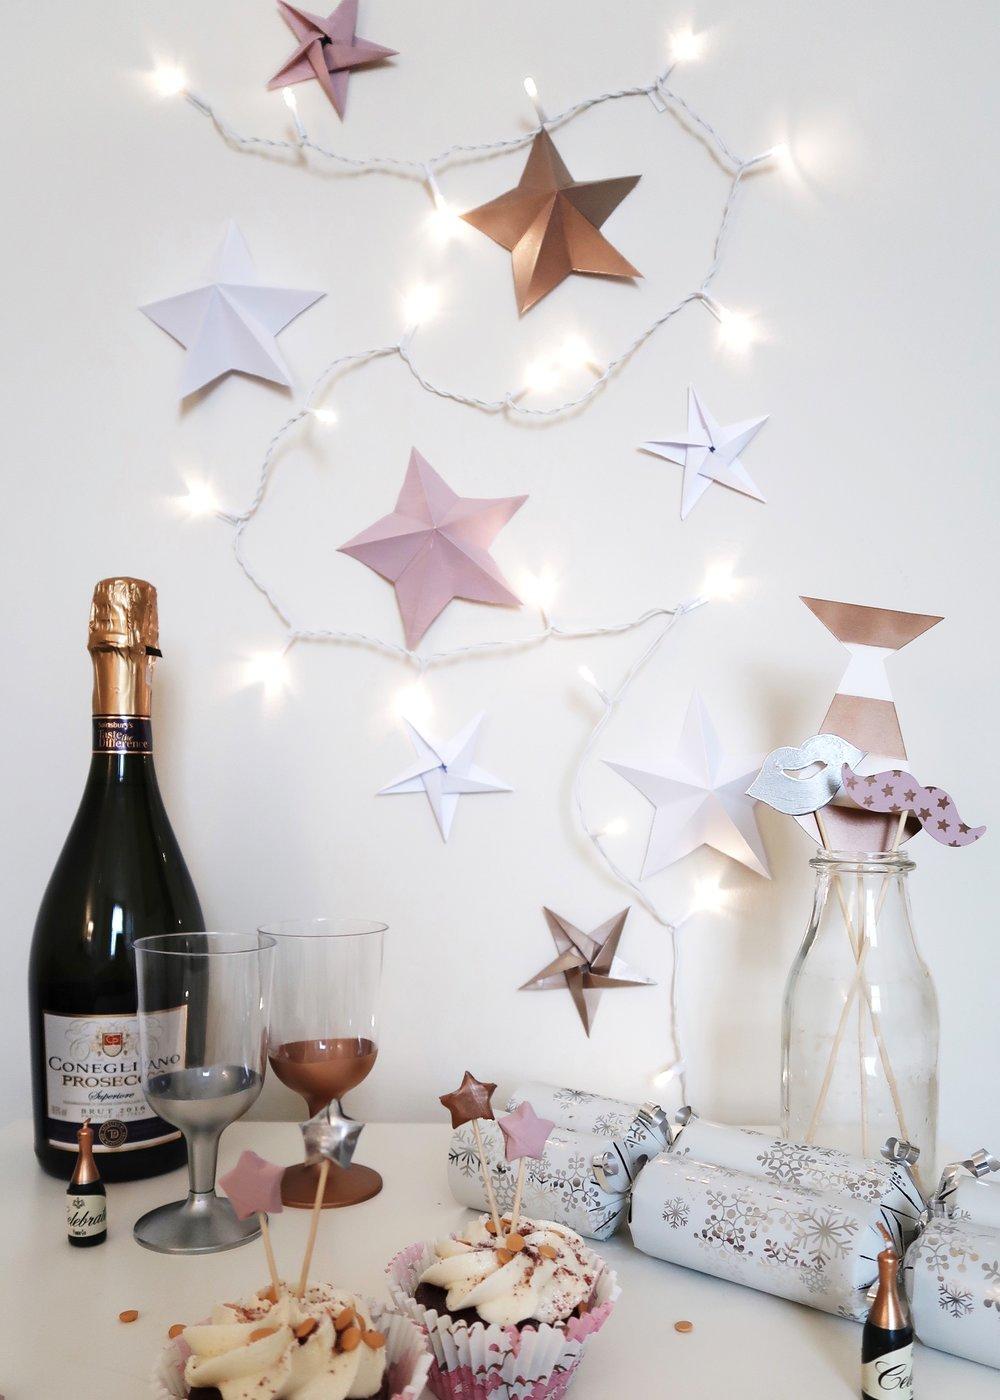 DIY Origami Star Backdrop by Isoscella